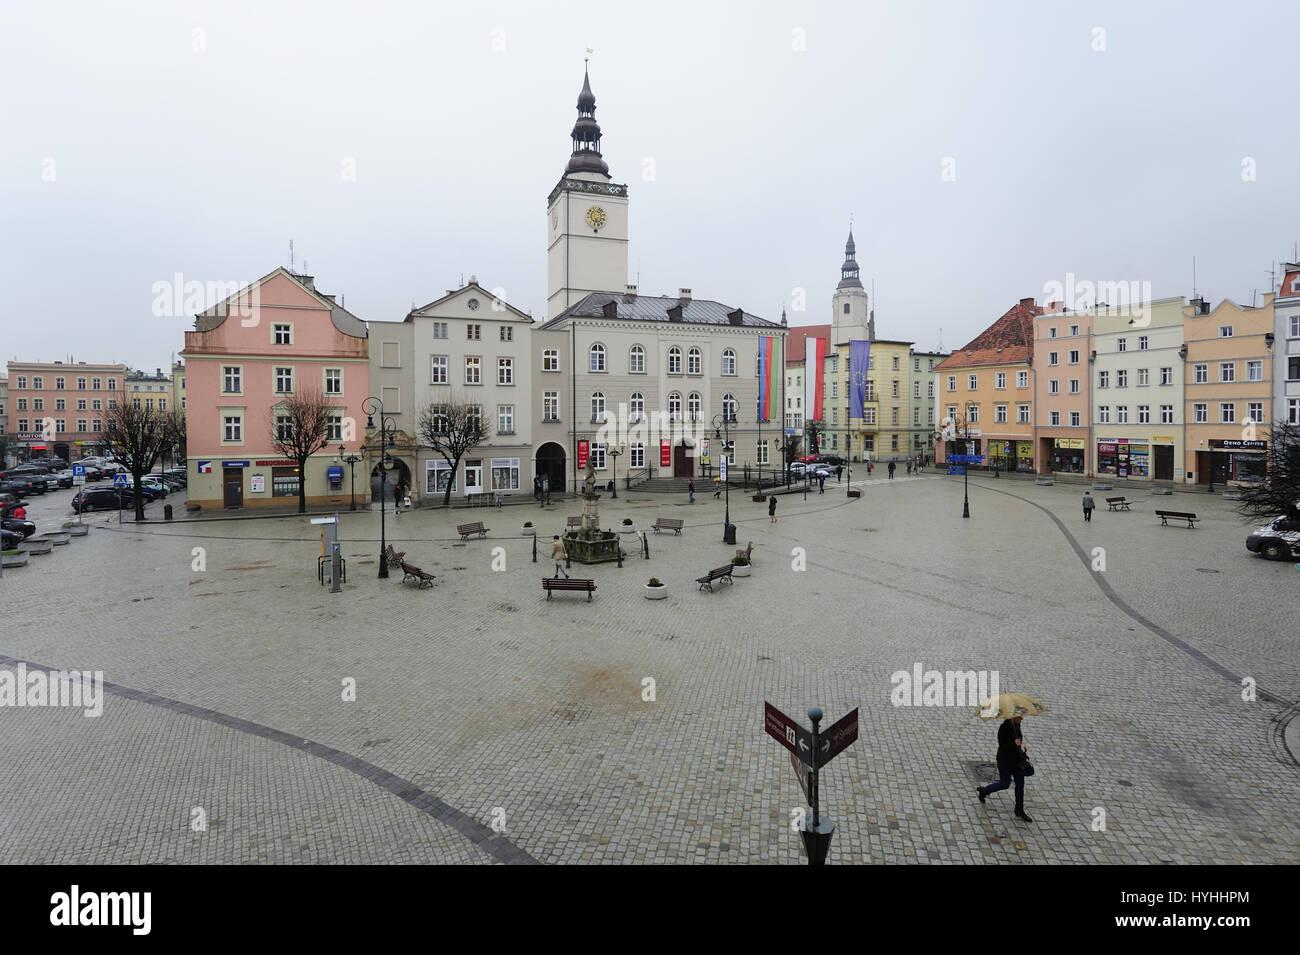 Achitecture, Arquitectura, Ciudad dolnoslaski, Dolnoslaskie, dzierzoniow, Europa, hall, Jan dzierzon, menor, menor Imagen De Stock